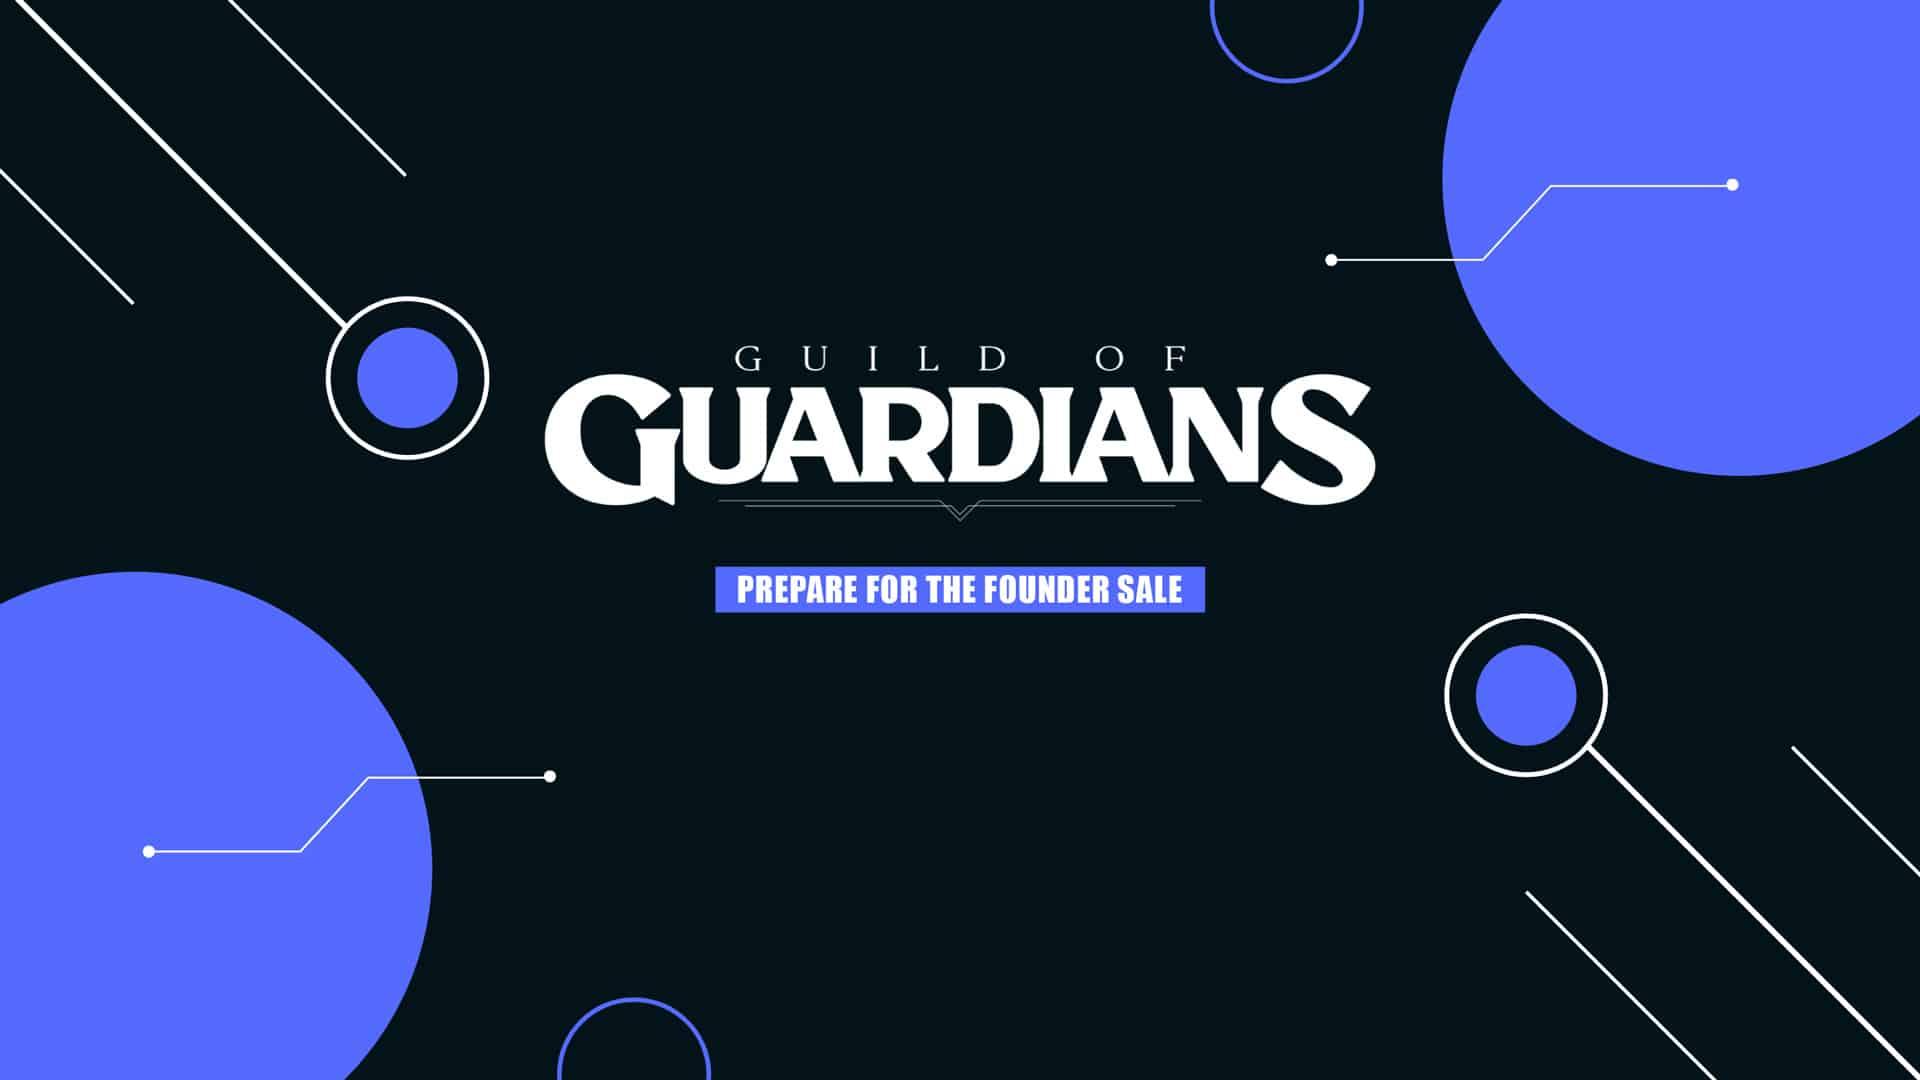 Guild of Guardians Founder Sale